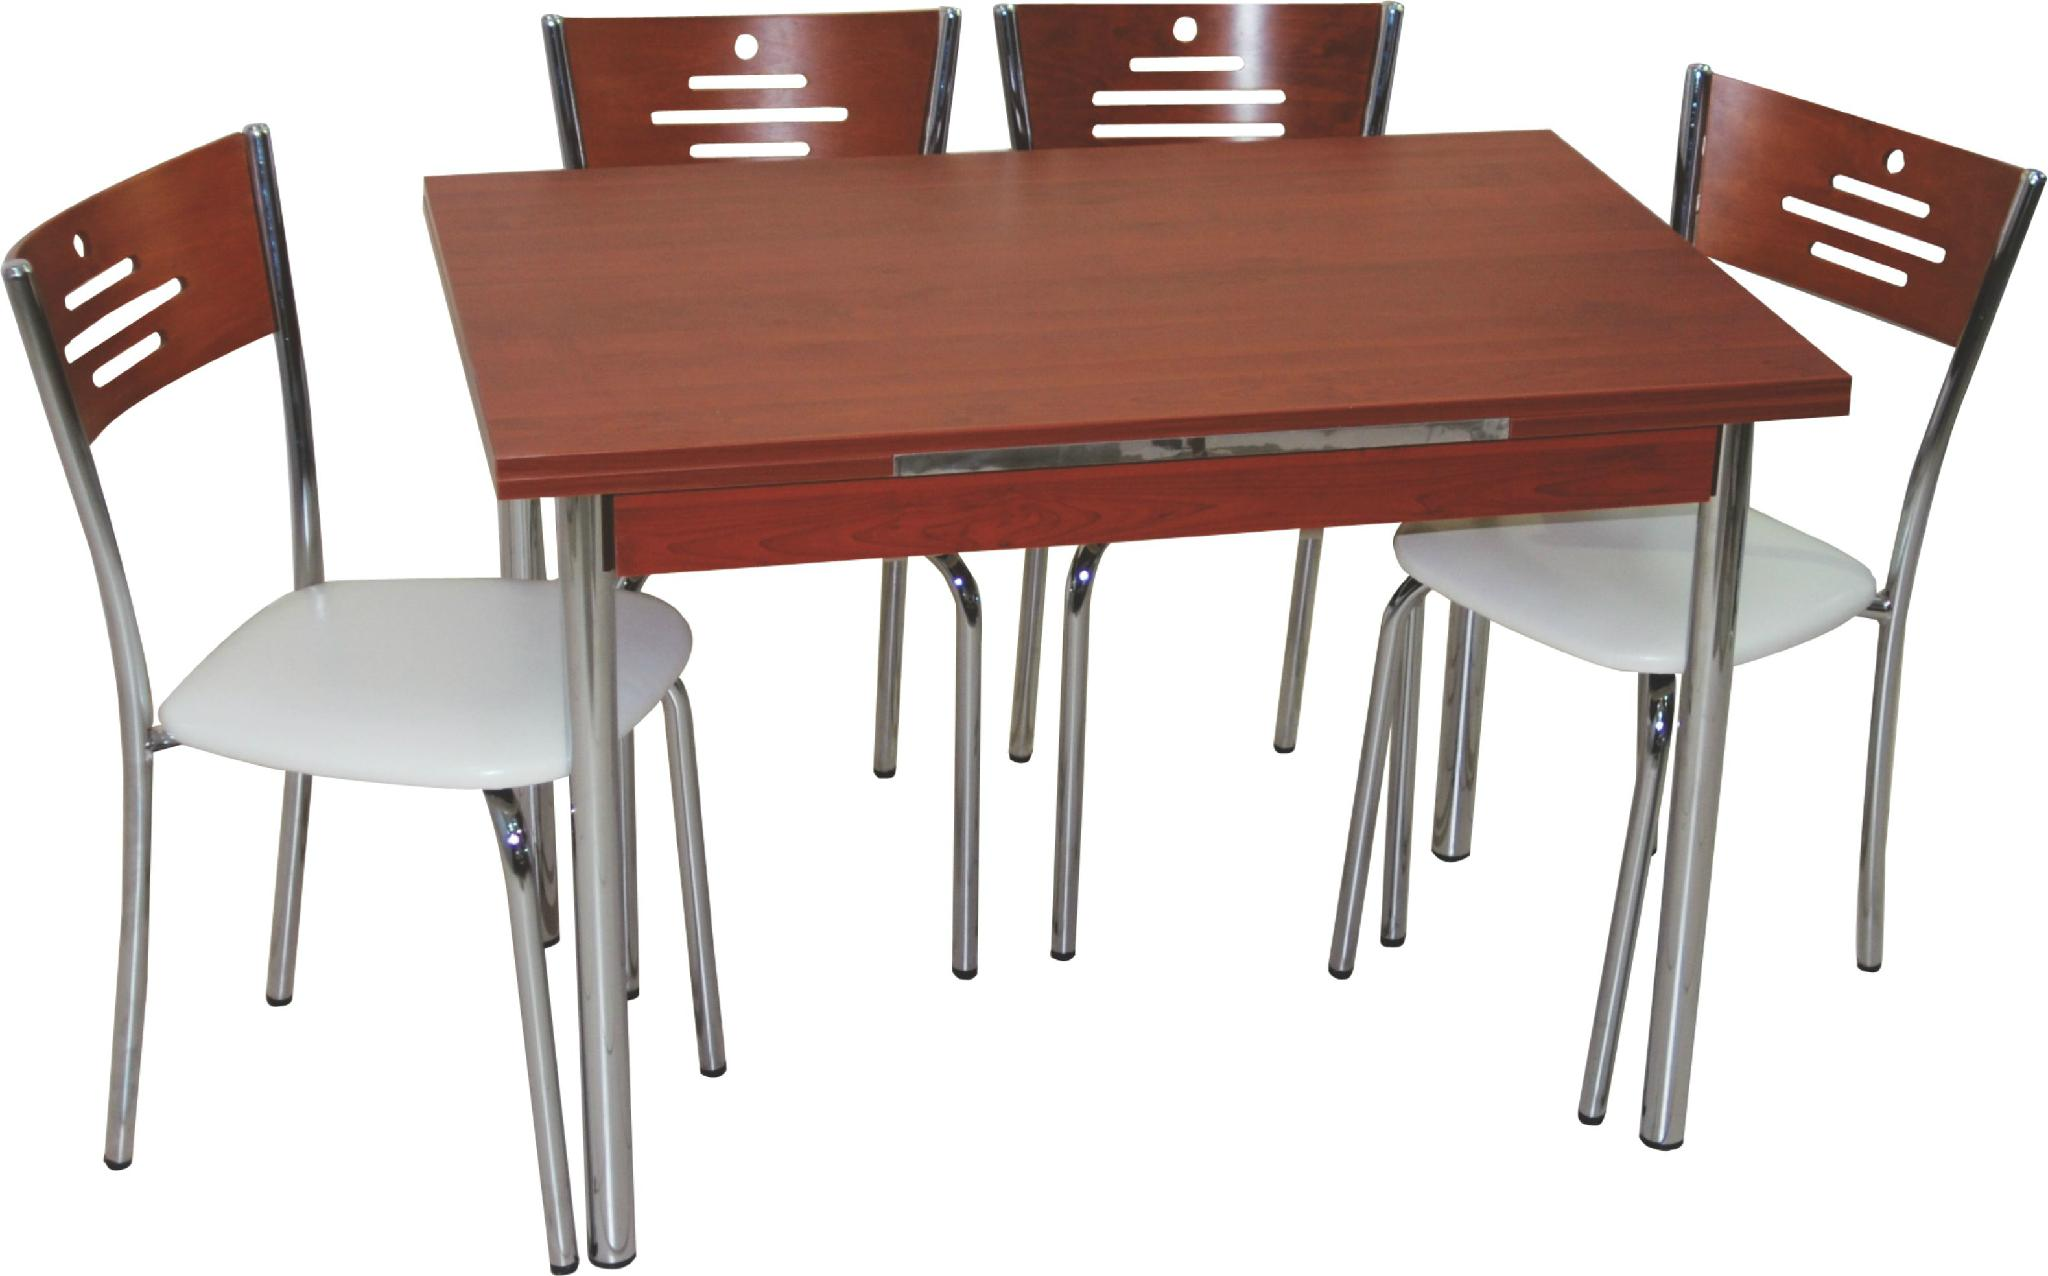 BAF 4025 TABLE - BAF 372 CHAIR 2